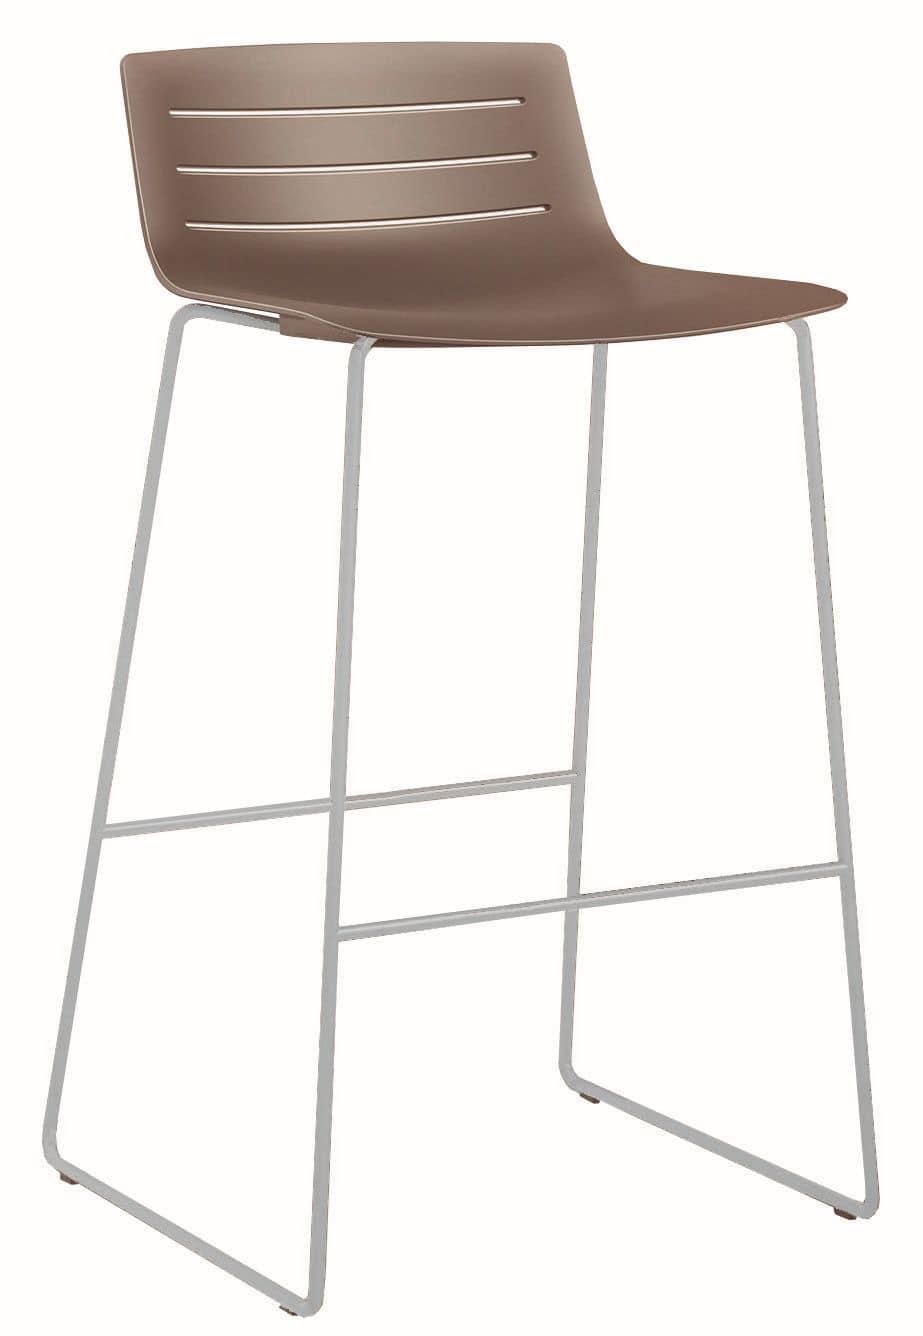 Slim 02SG, Metal and plastic stool for bars and restaurants